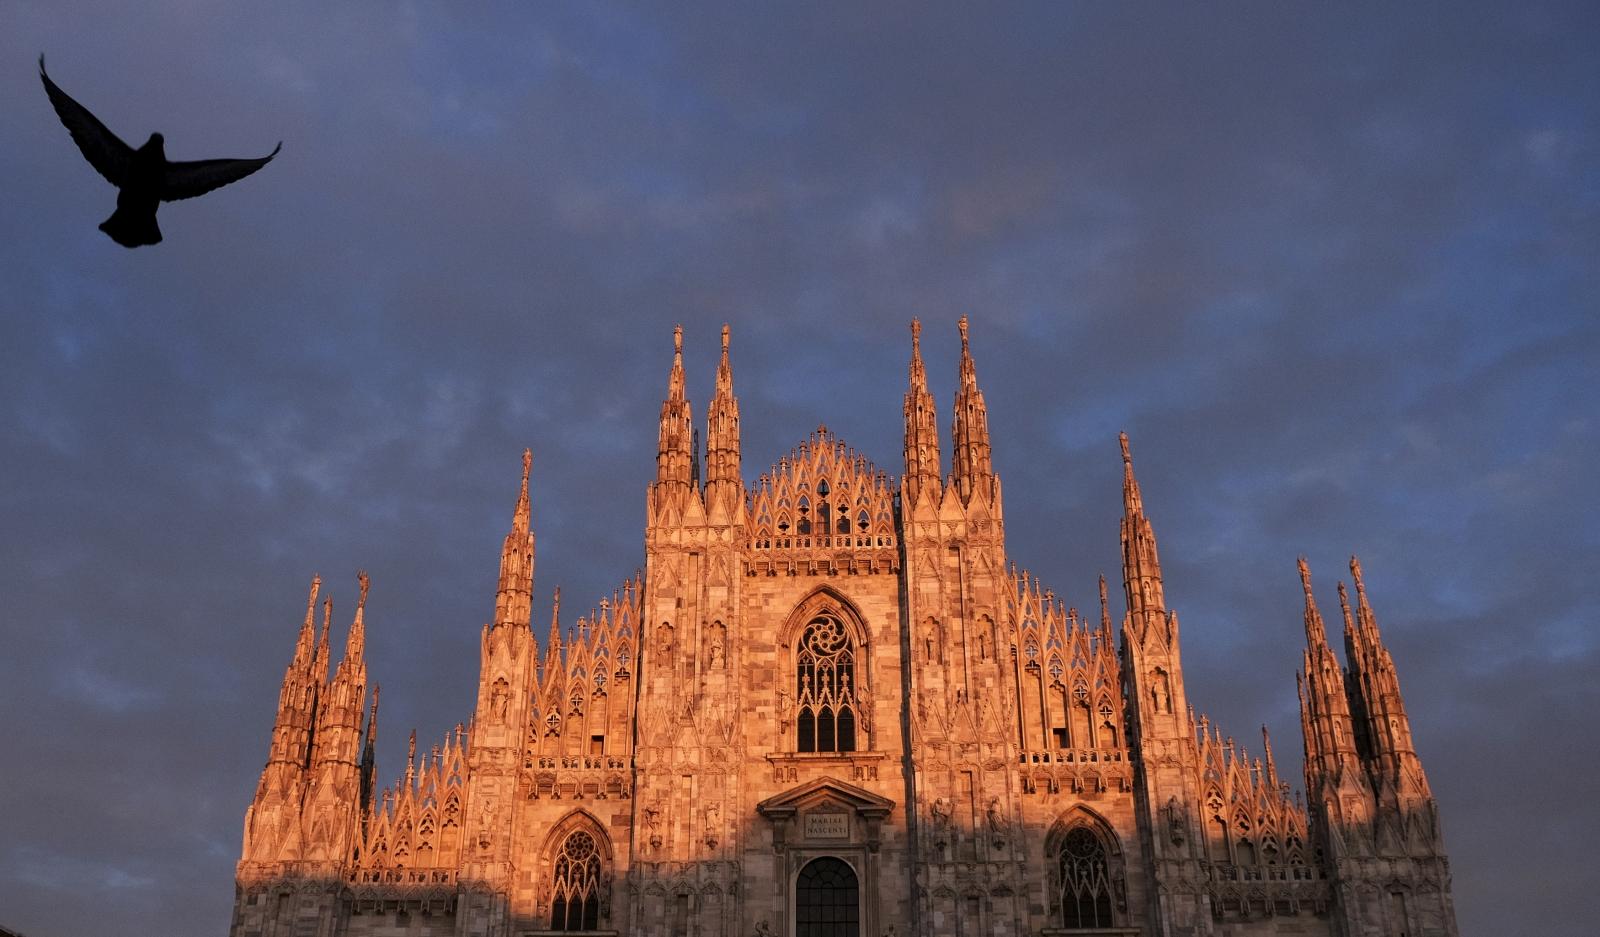 Milan Cathedral in Piazza del Duomo